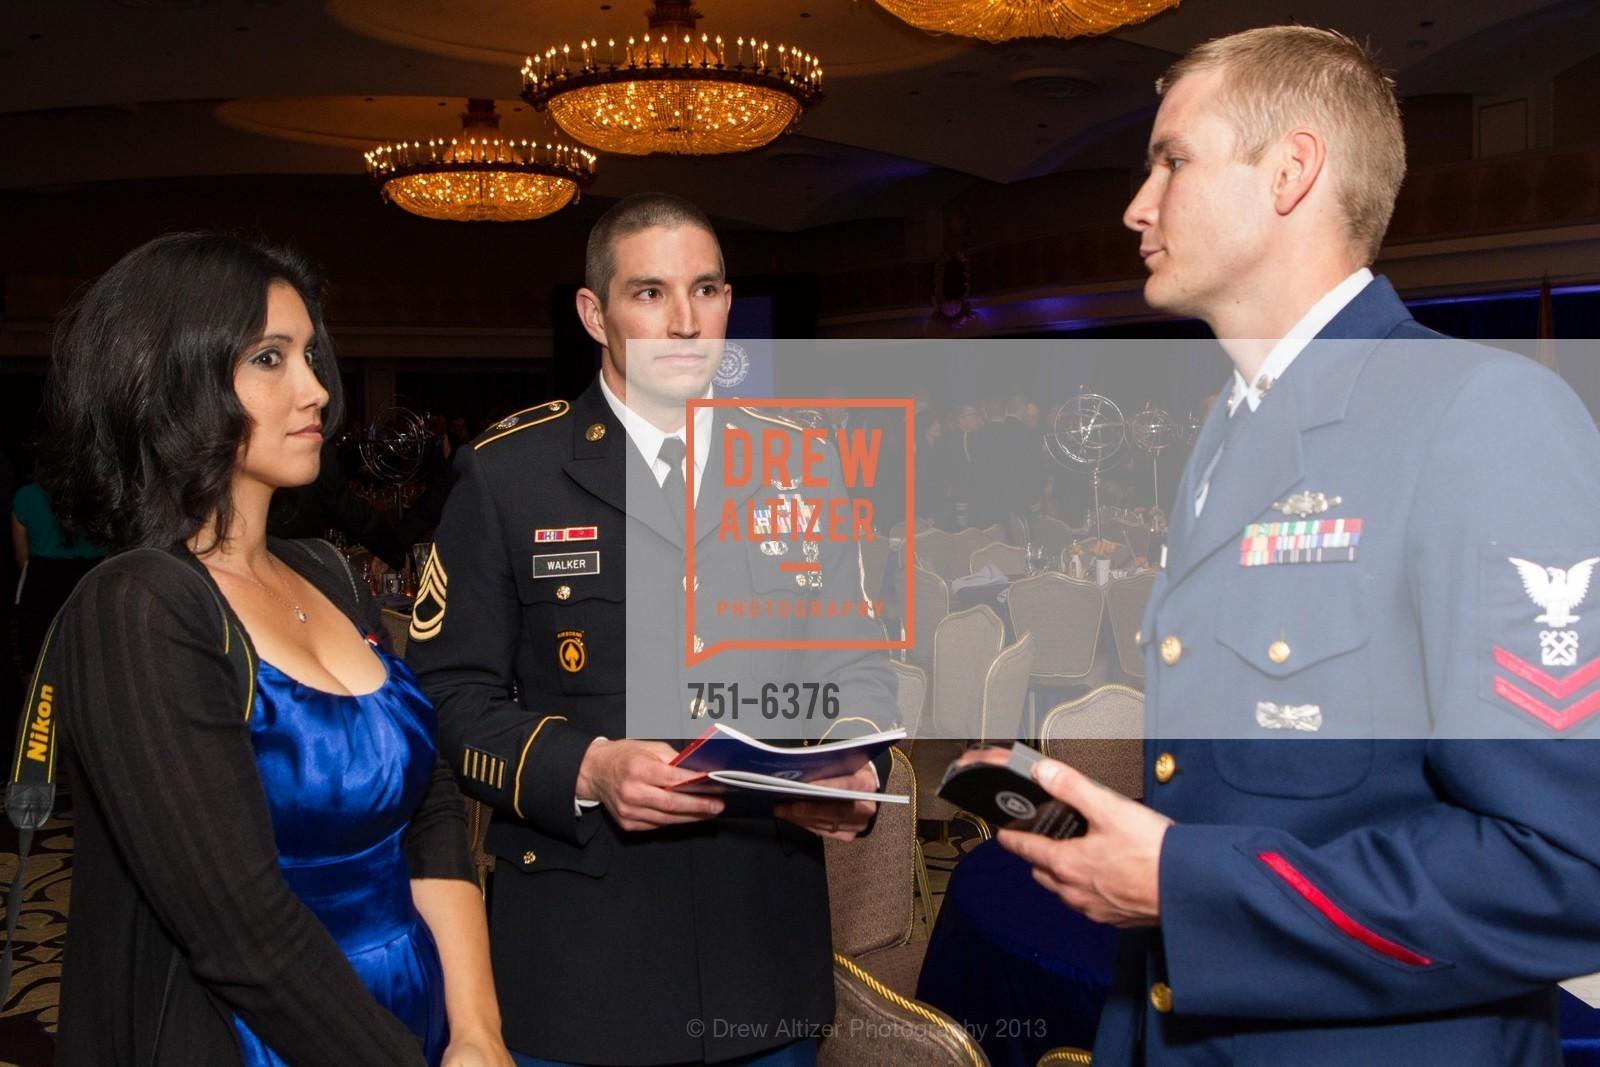 Ivi D'Arcy, Russ Walker, Michael Walker, COAST GUARD FOUNDATION Presents Pacific Awards Dinner, US, April 25th, 2013